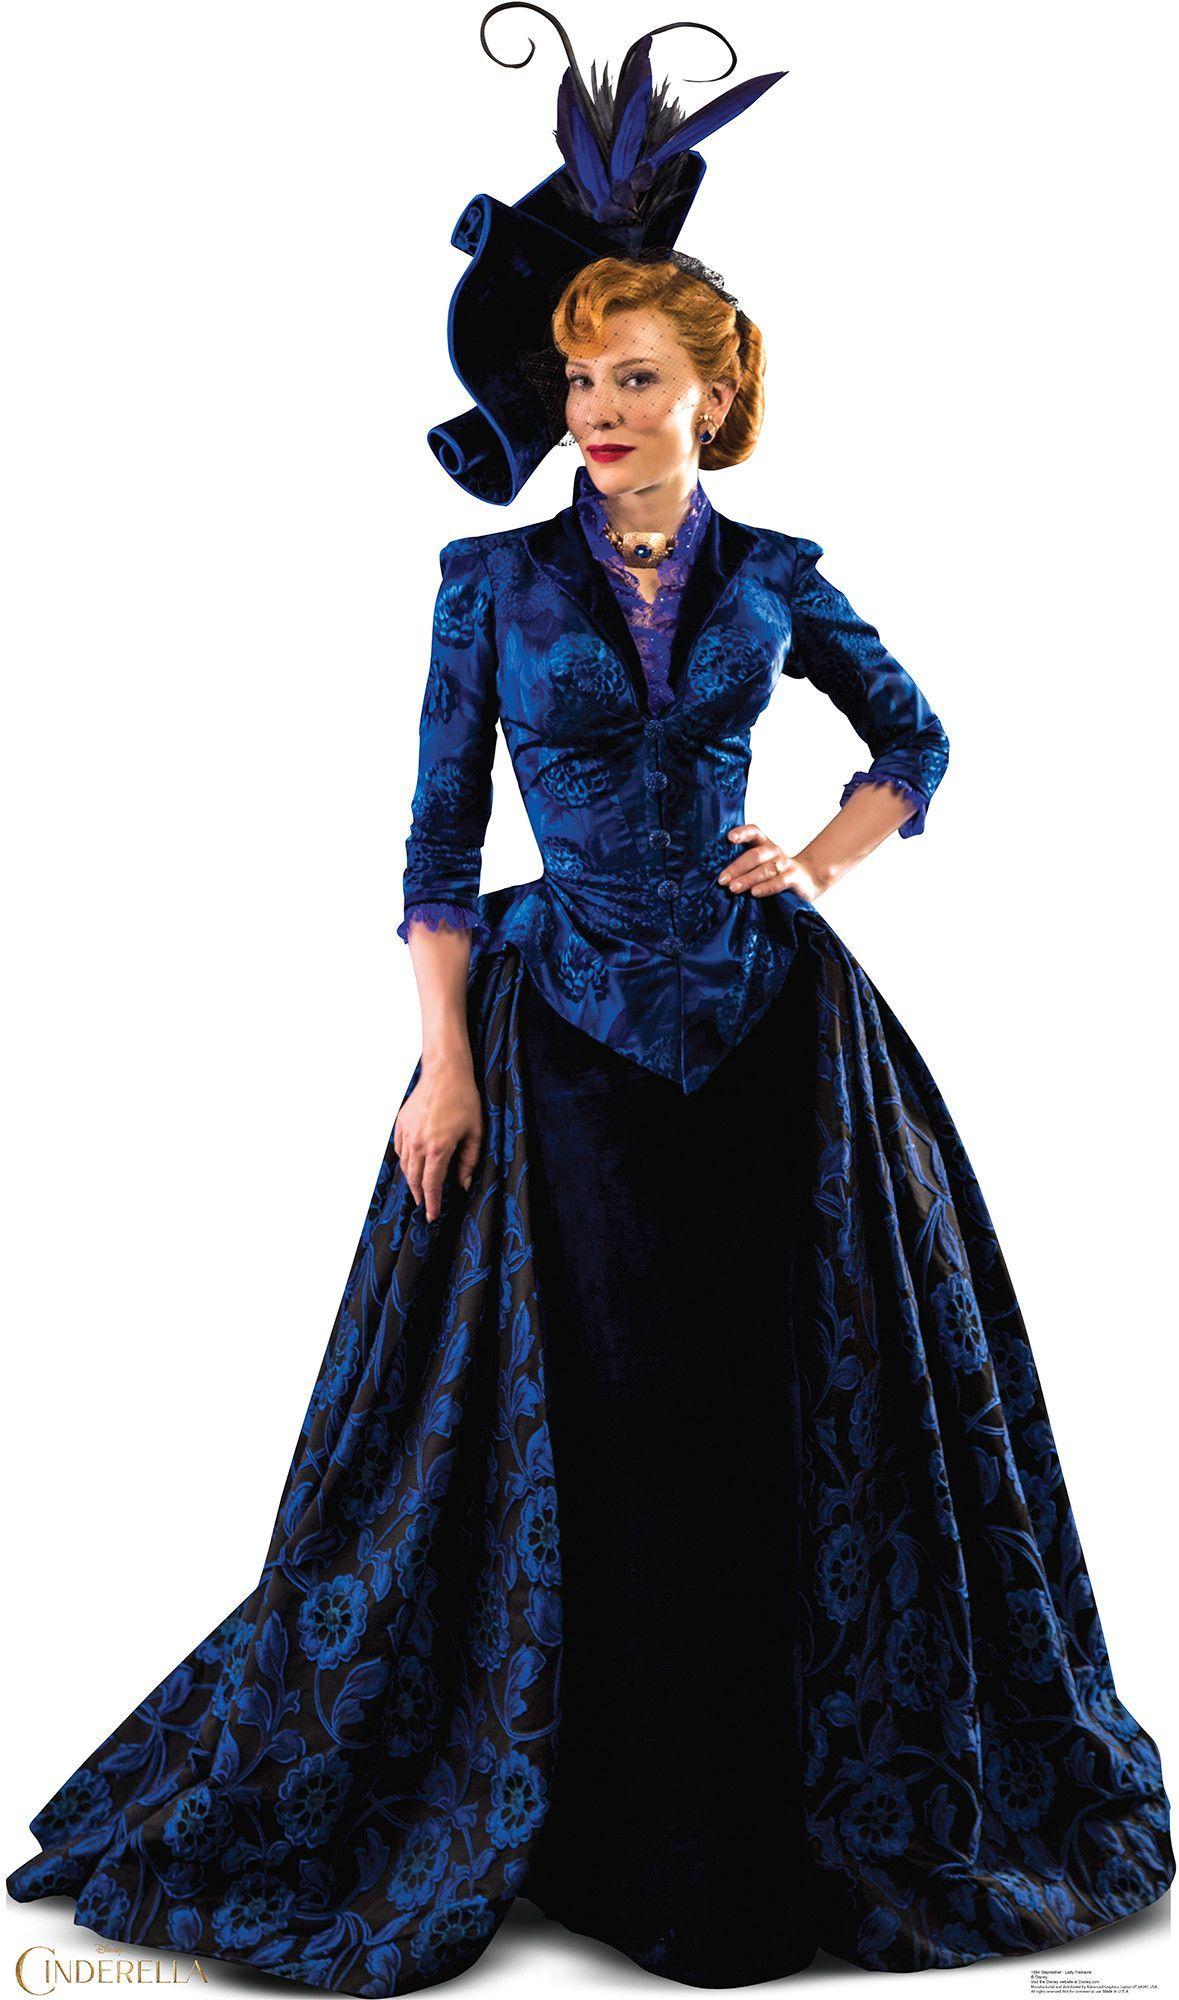 Dress up of cinderella - Cinderella 2015 Stepmother Cardboard Standup